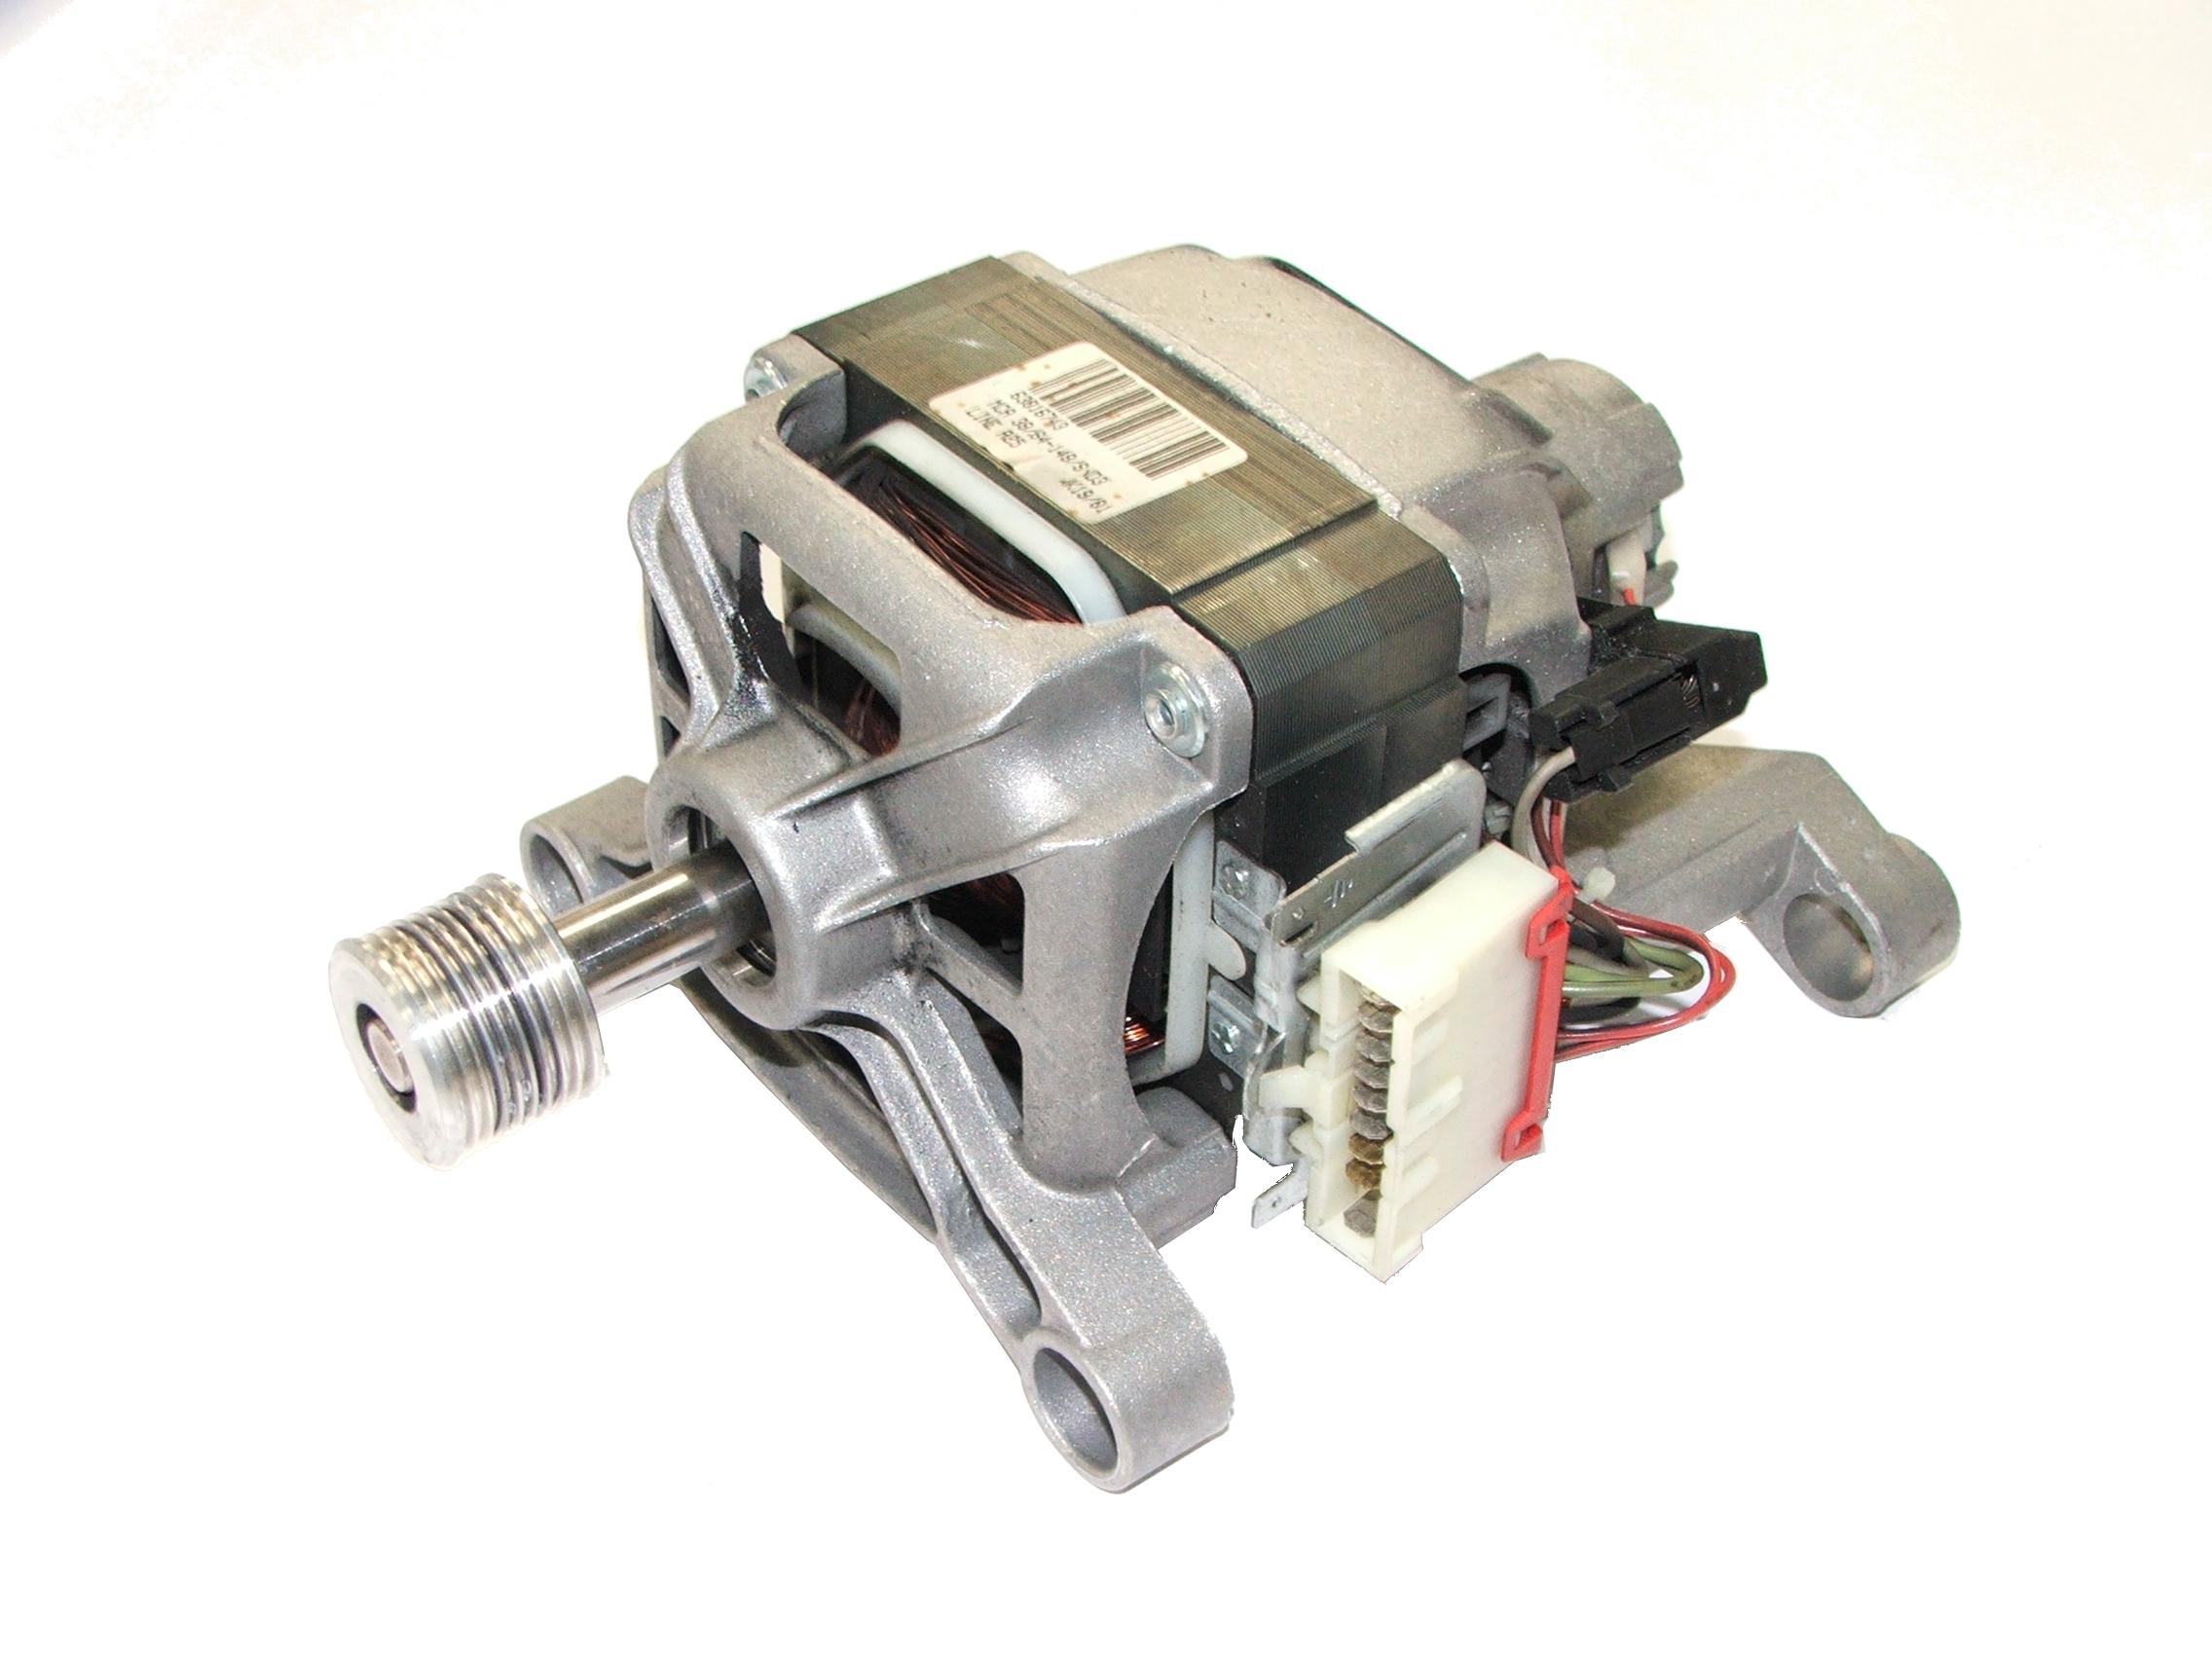 Dyson CR01 Washing Machine Ceset Motor MCA 38/64-148/SND3 ...